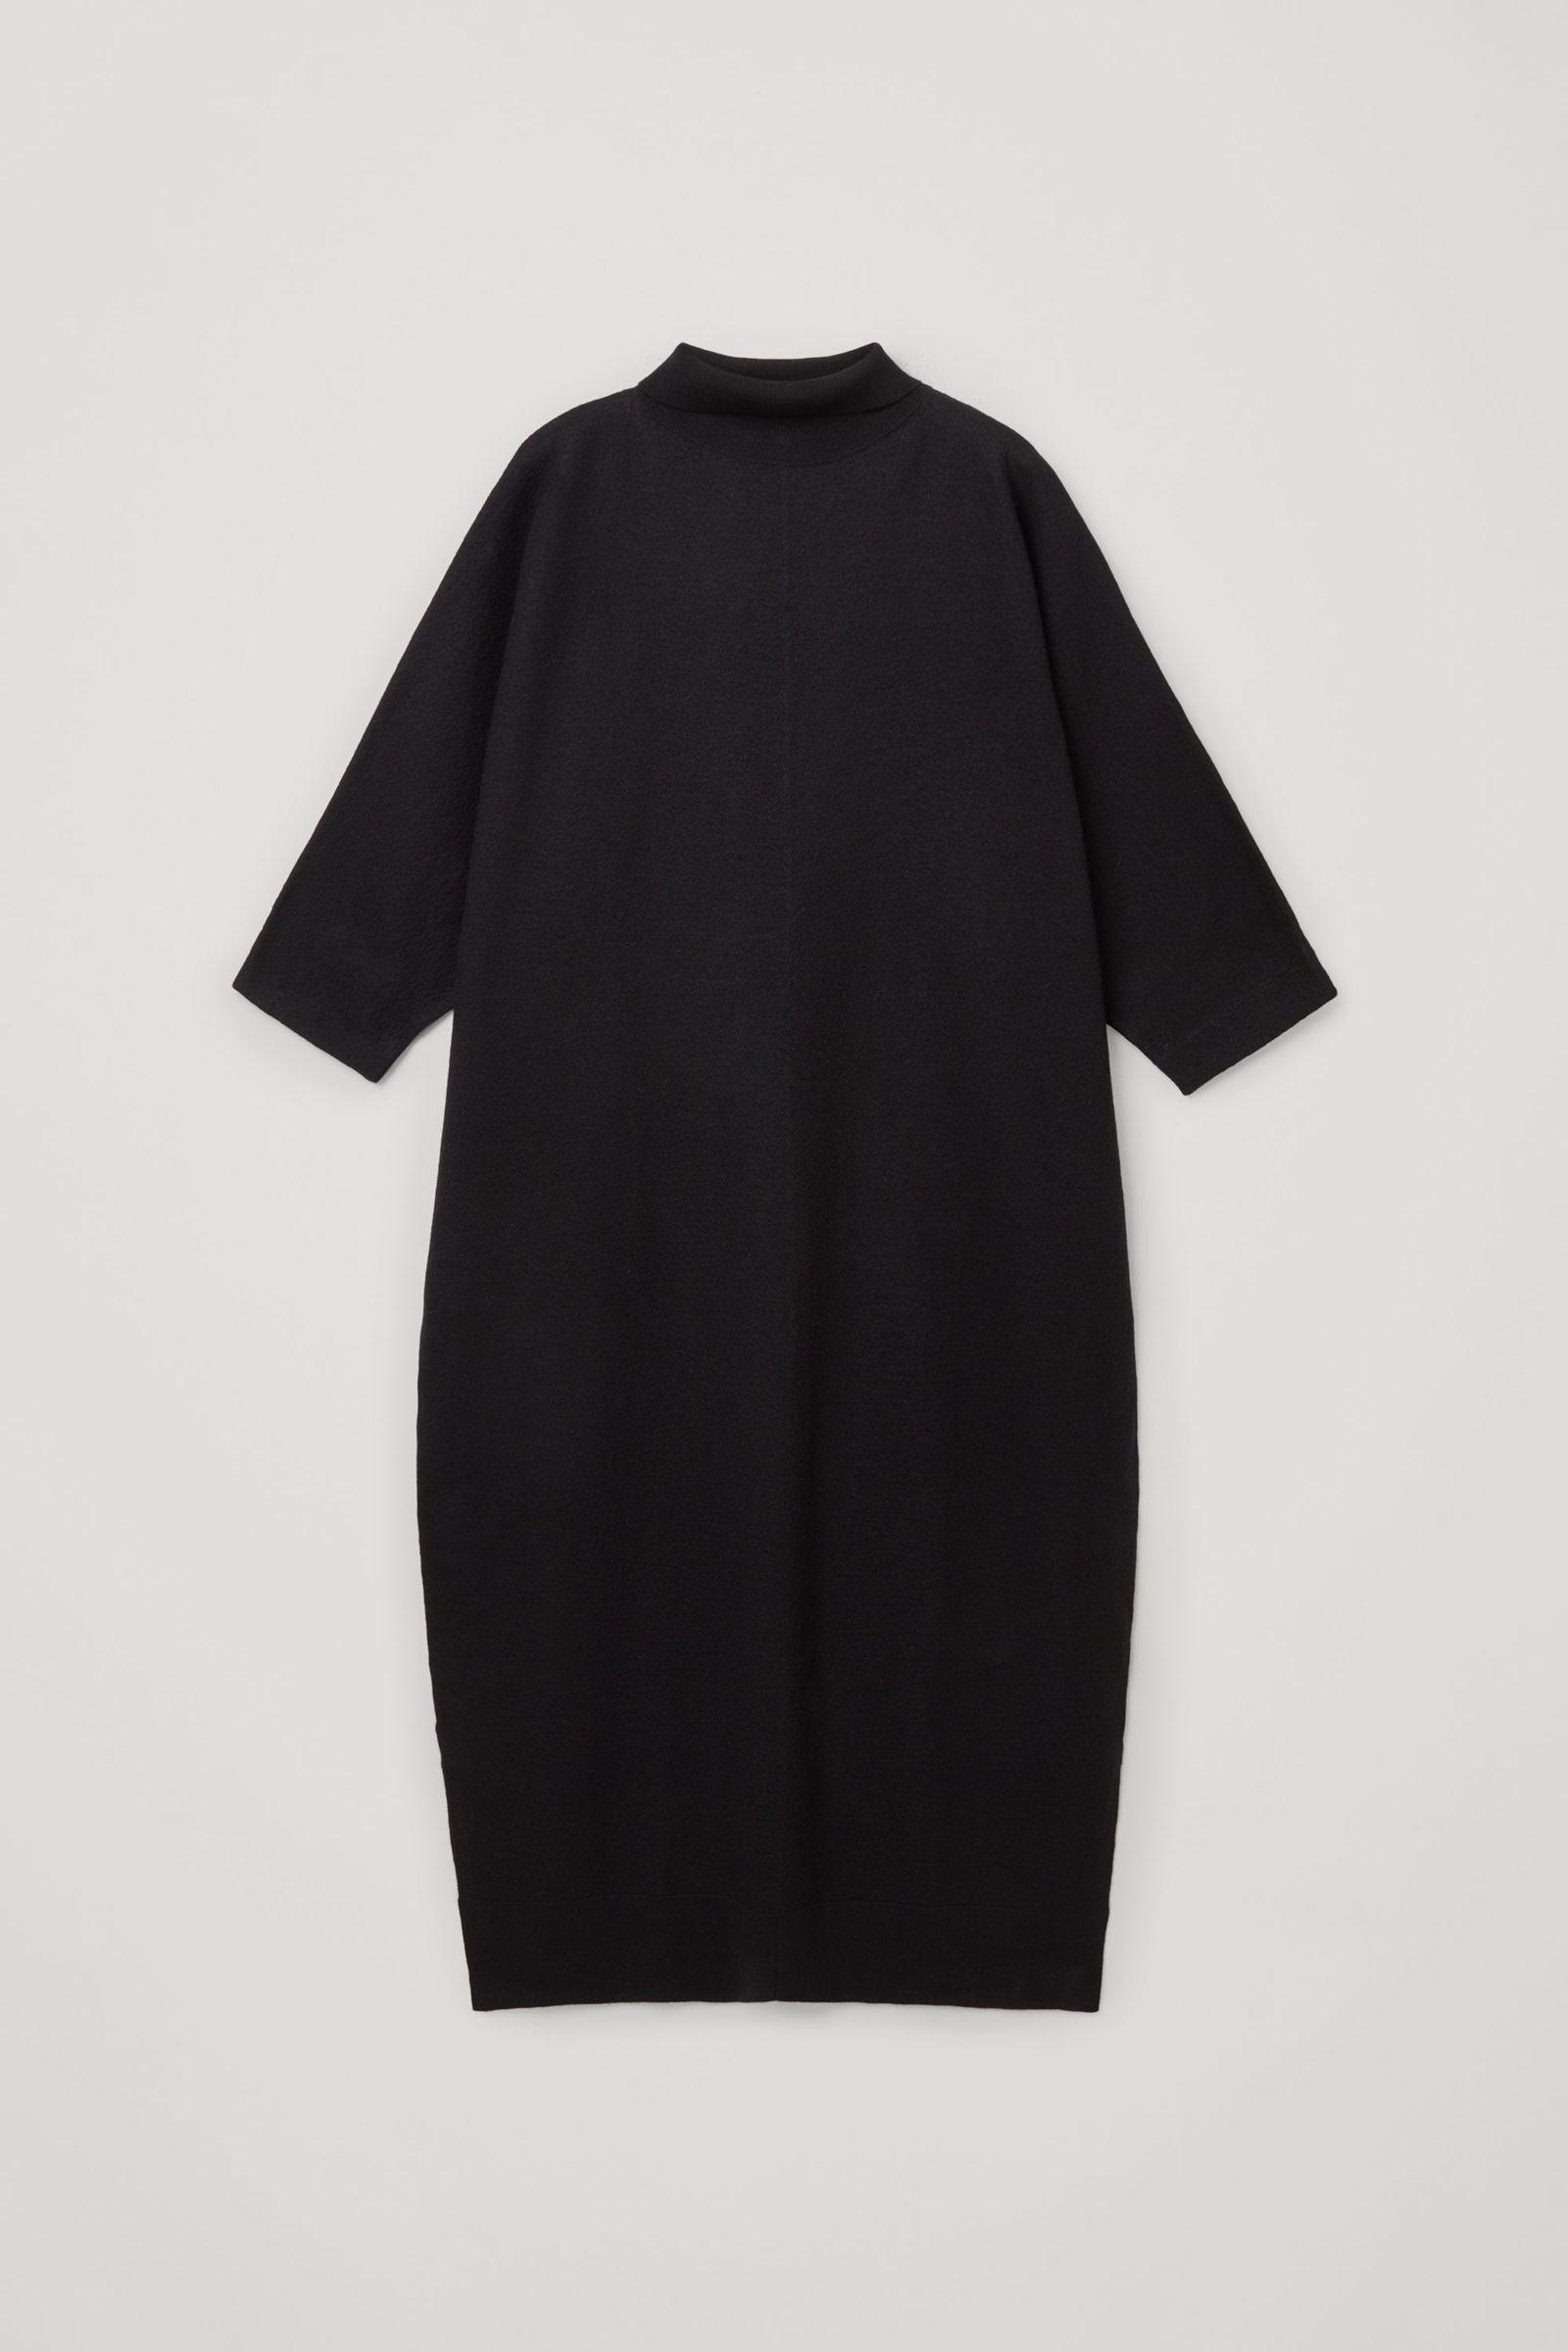 COS 메리노 울 롤넥 니티드 맥시 드레스의 블랙컬러 Product입니다.